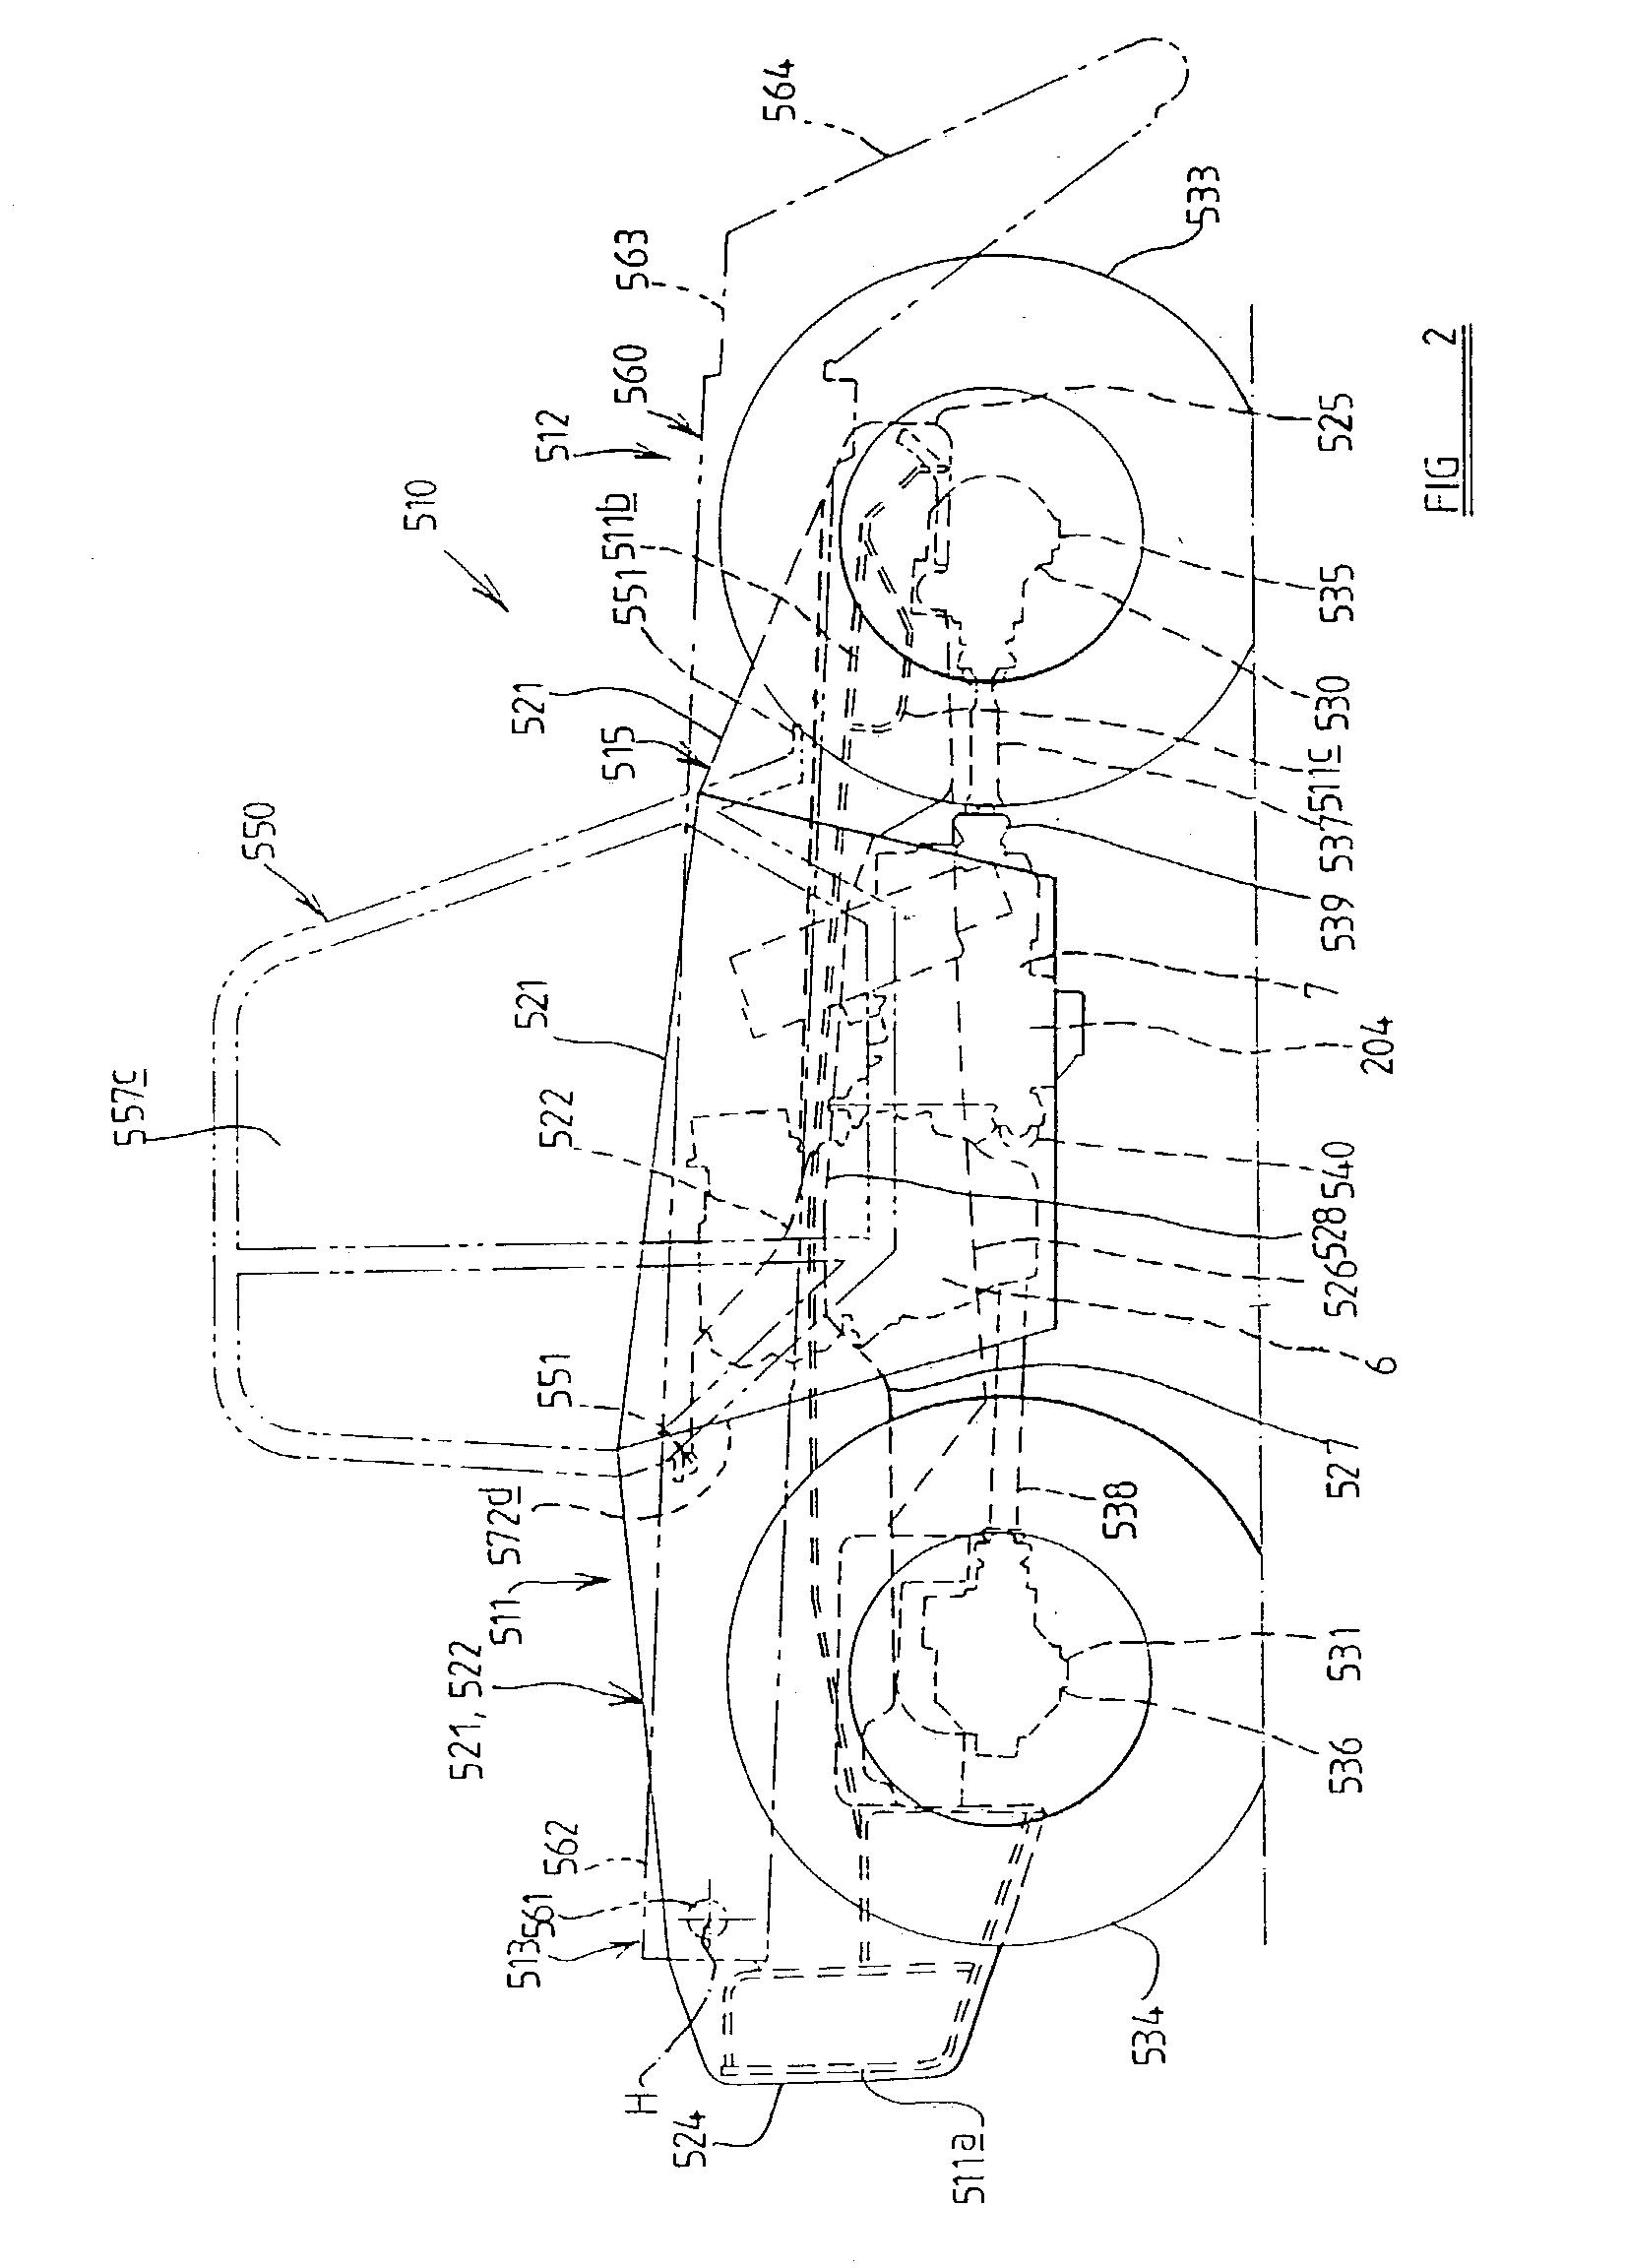 massey ferguson 35 wiring diagram 2000 bmw 323i radio 540 ford tractor get free image about